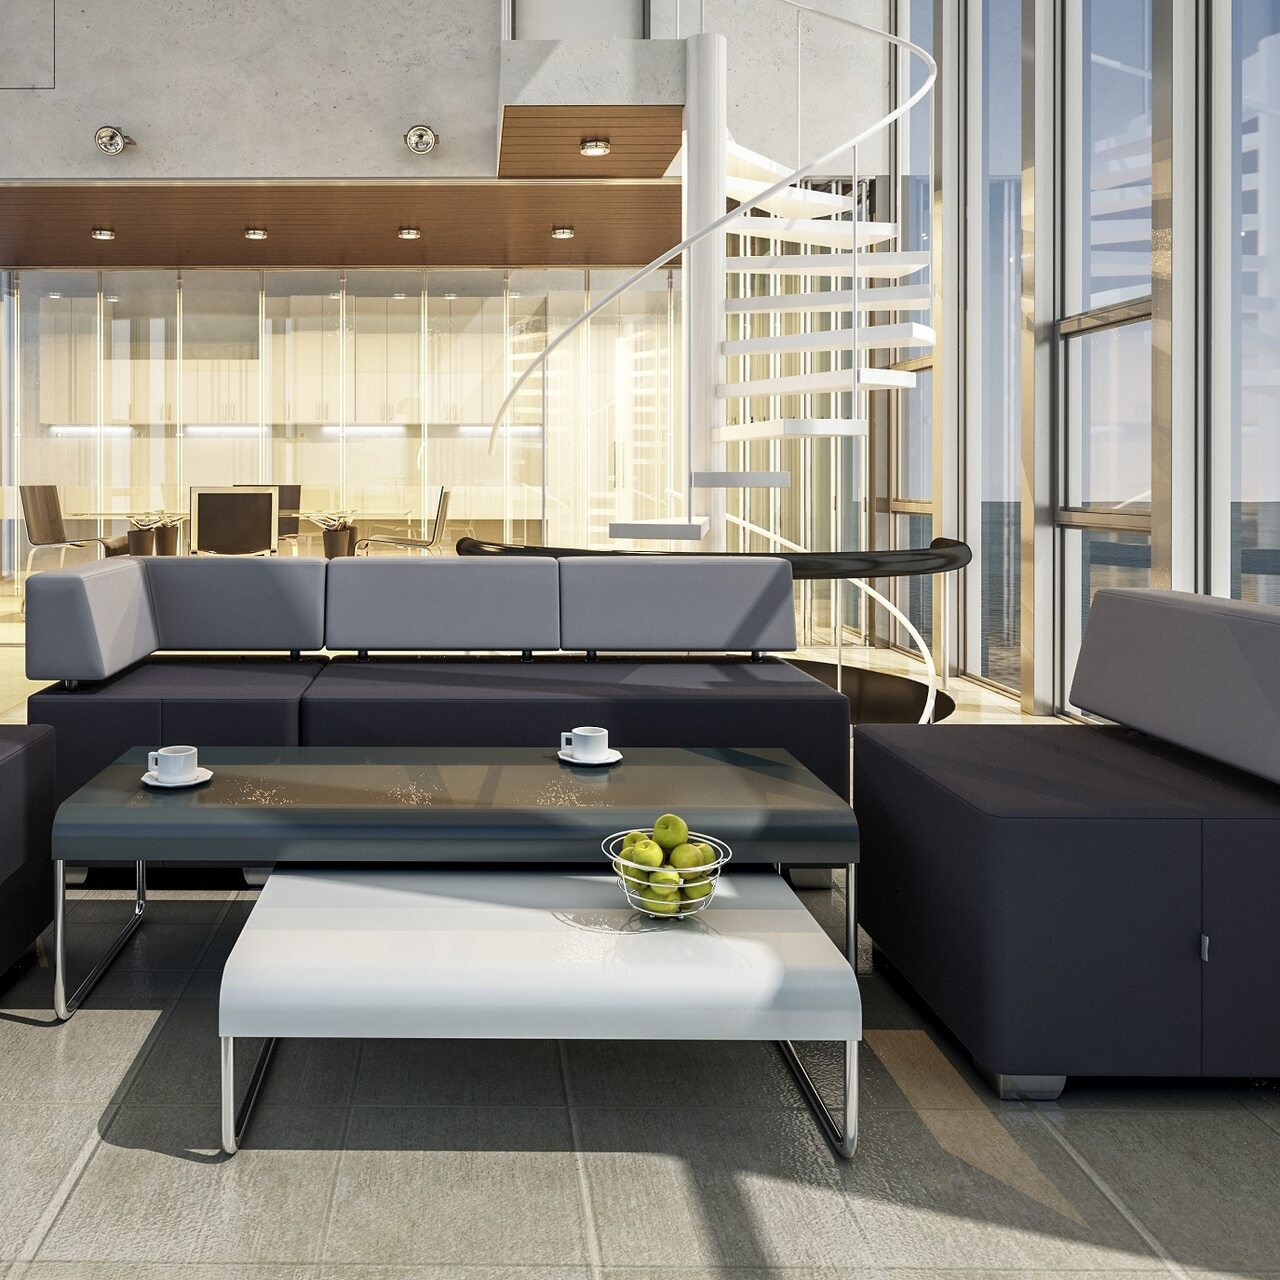 Мягкая офисная мебель М2 Unlimited space - фото 1